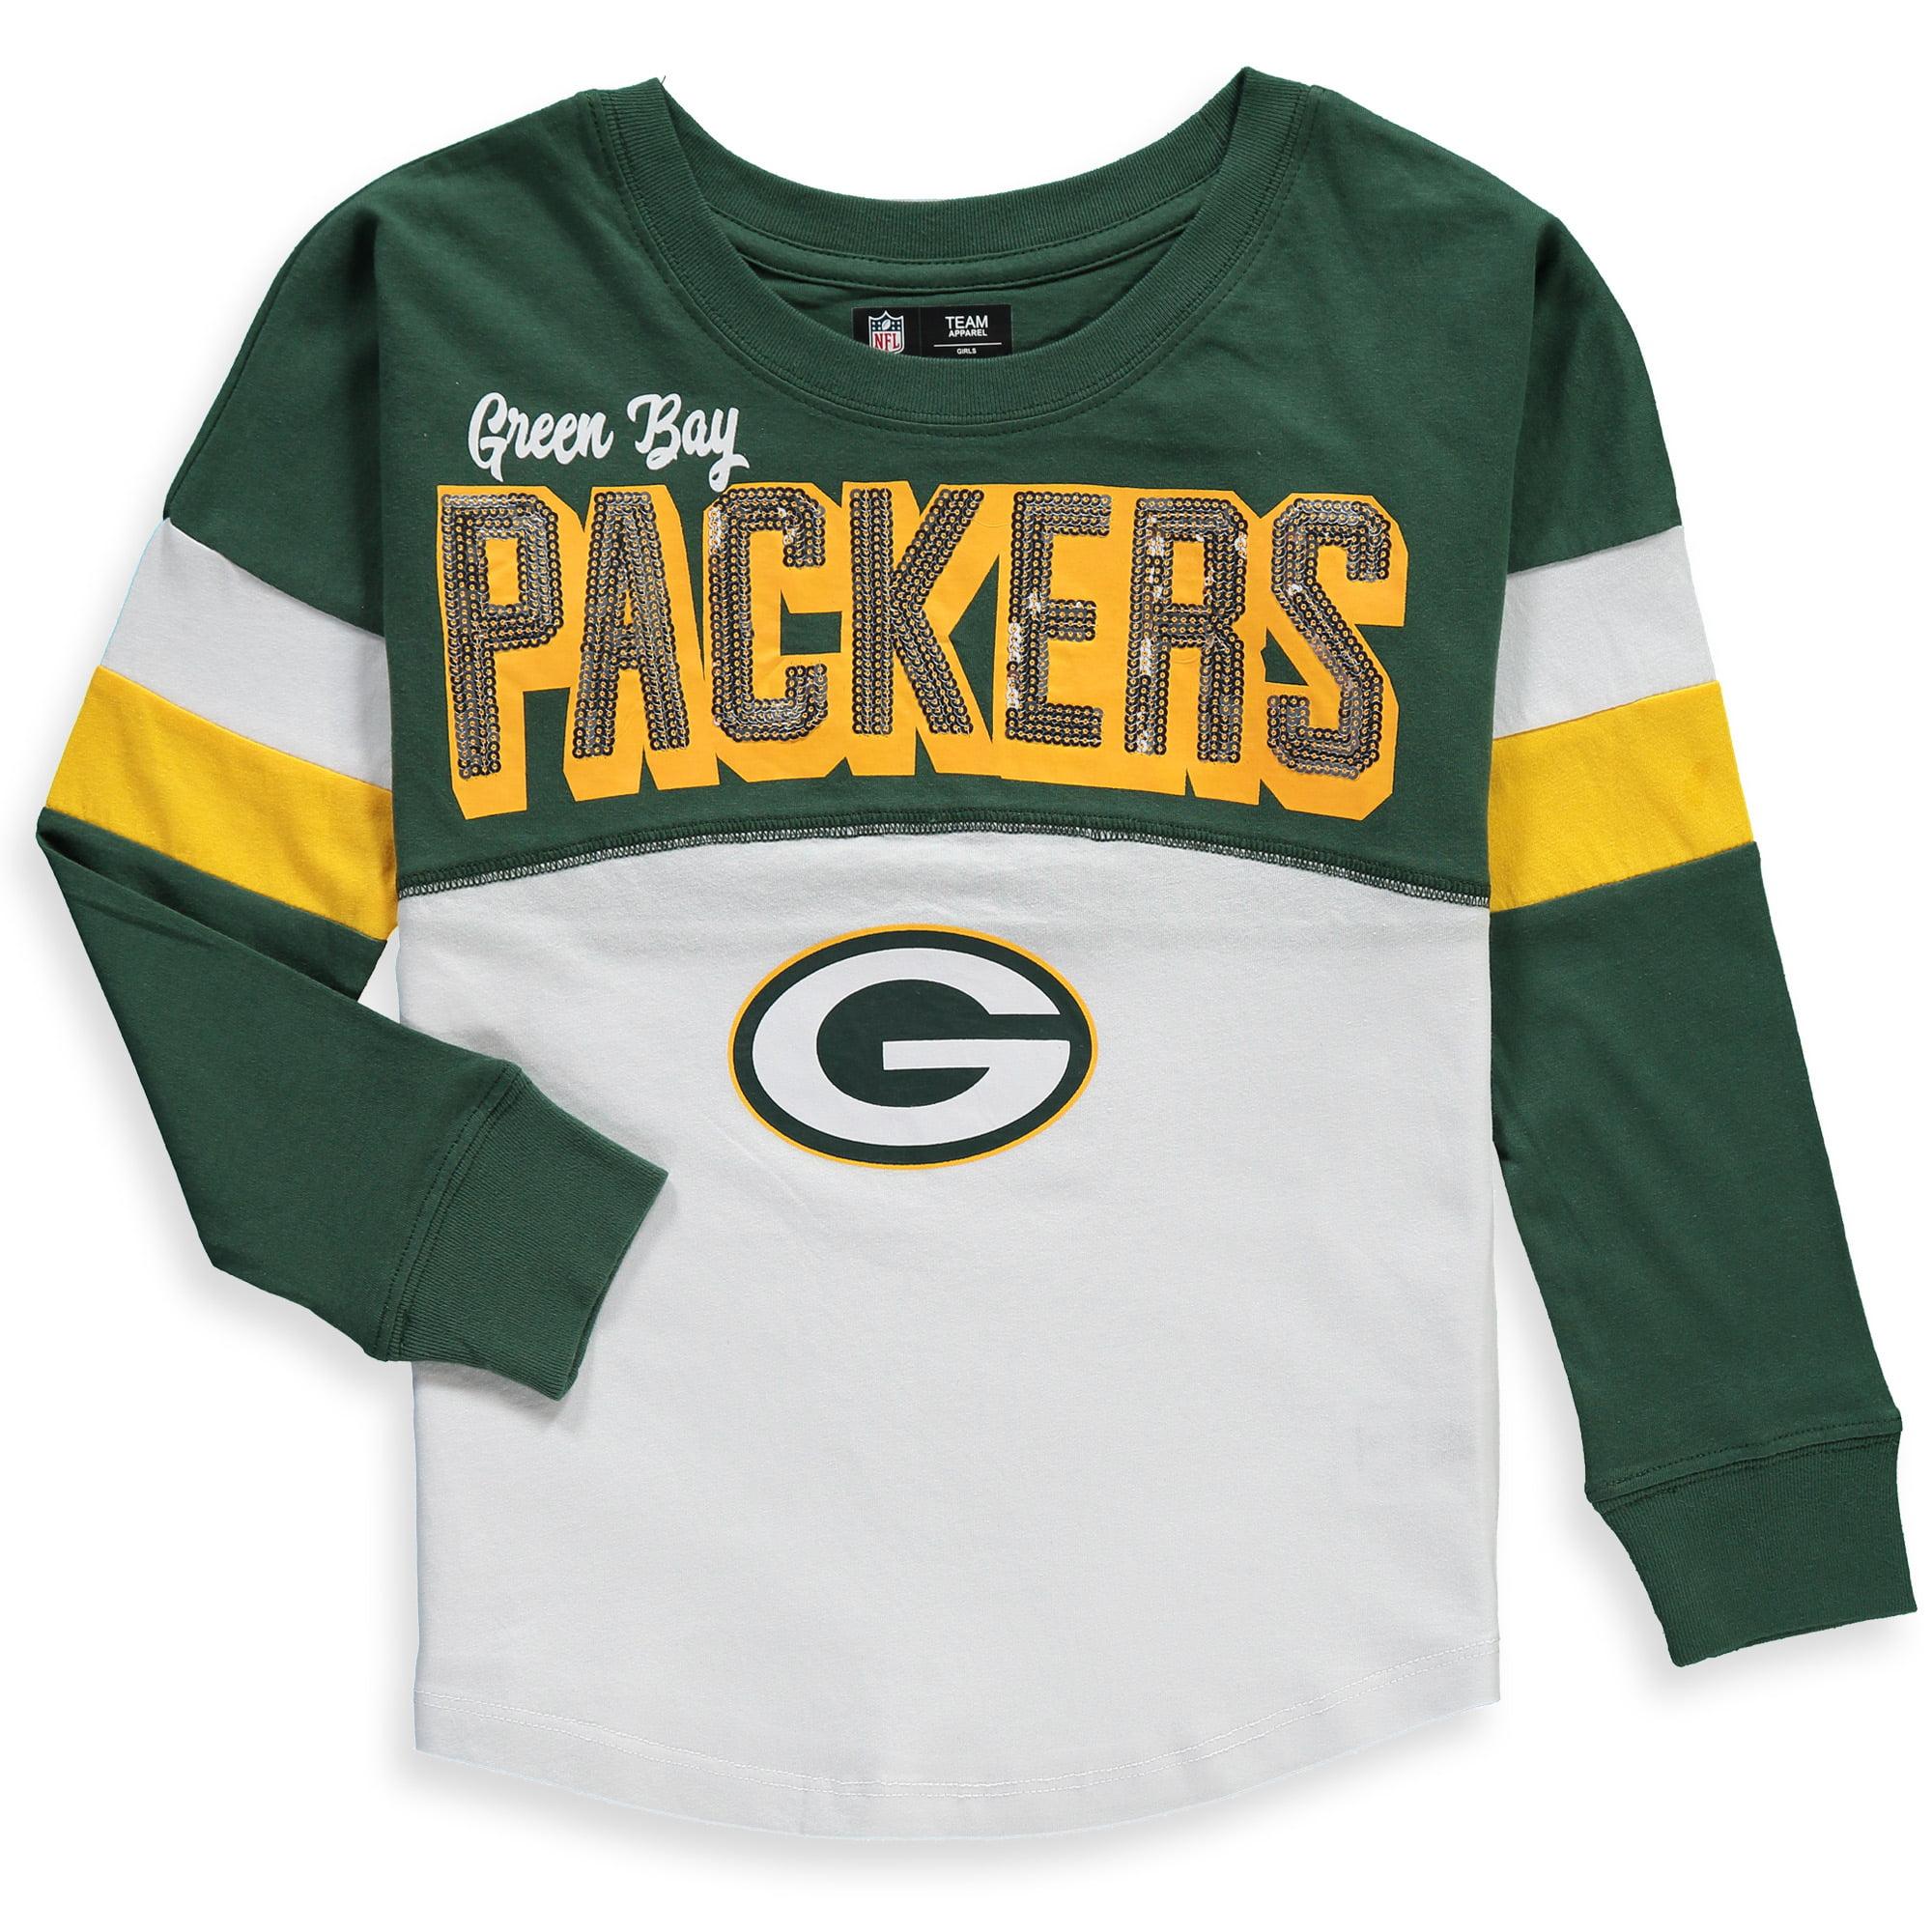 Green Bay Packers New Era Girls Youth Baby Jersey Long Sleeve T-Shirt - White/Green